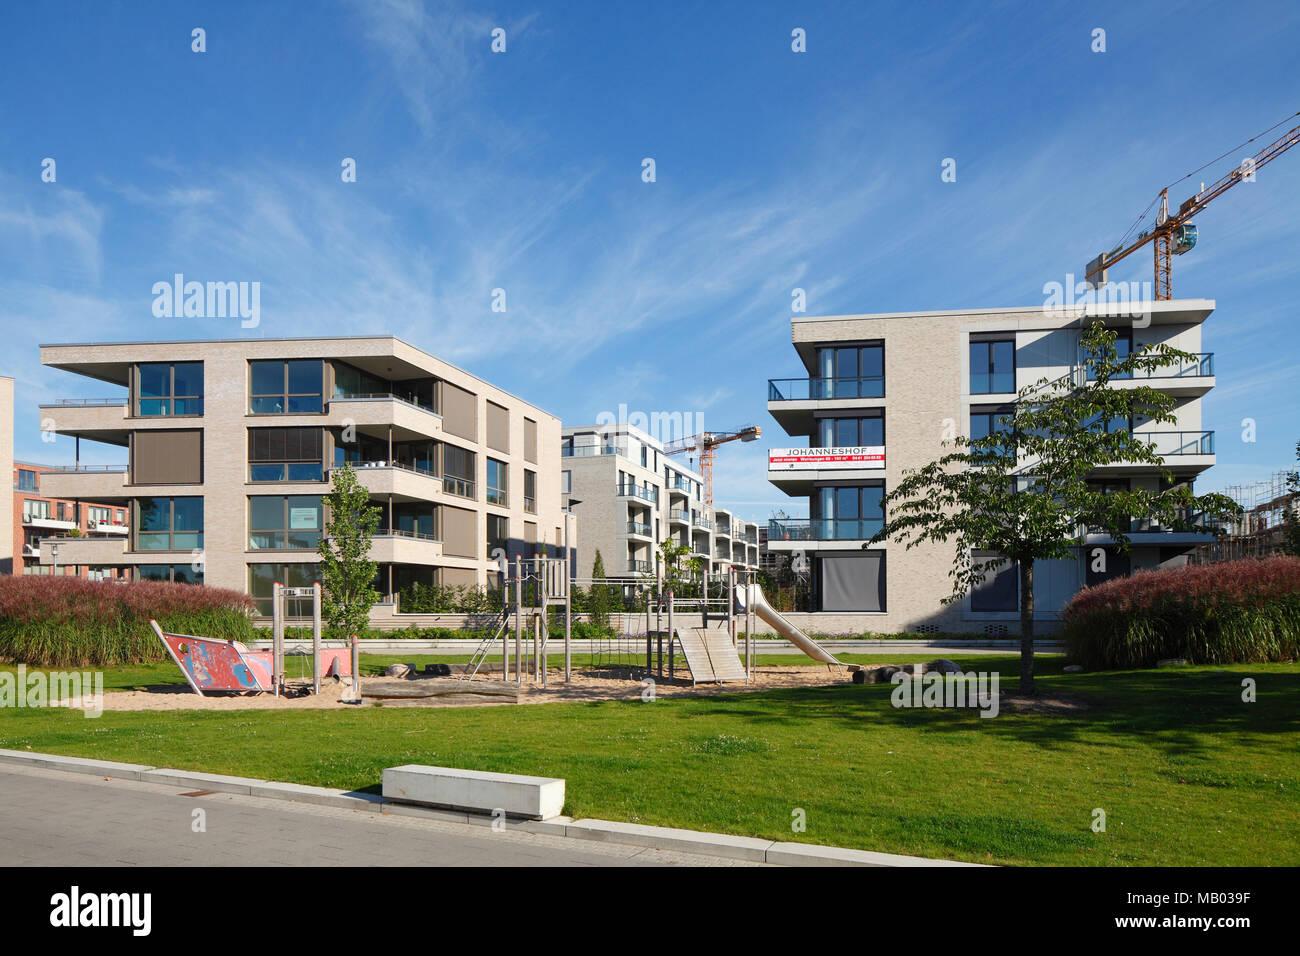 Schön Moderne Mehrfamilienhäuser Beste Wahl Modern Apartment Buildings, Oldenburg In Oldenburg, Lower